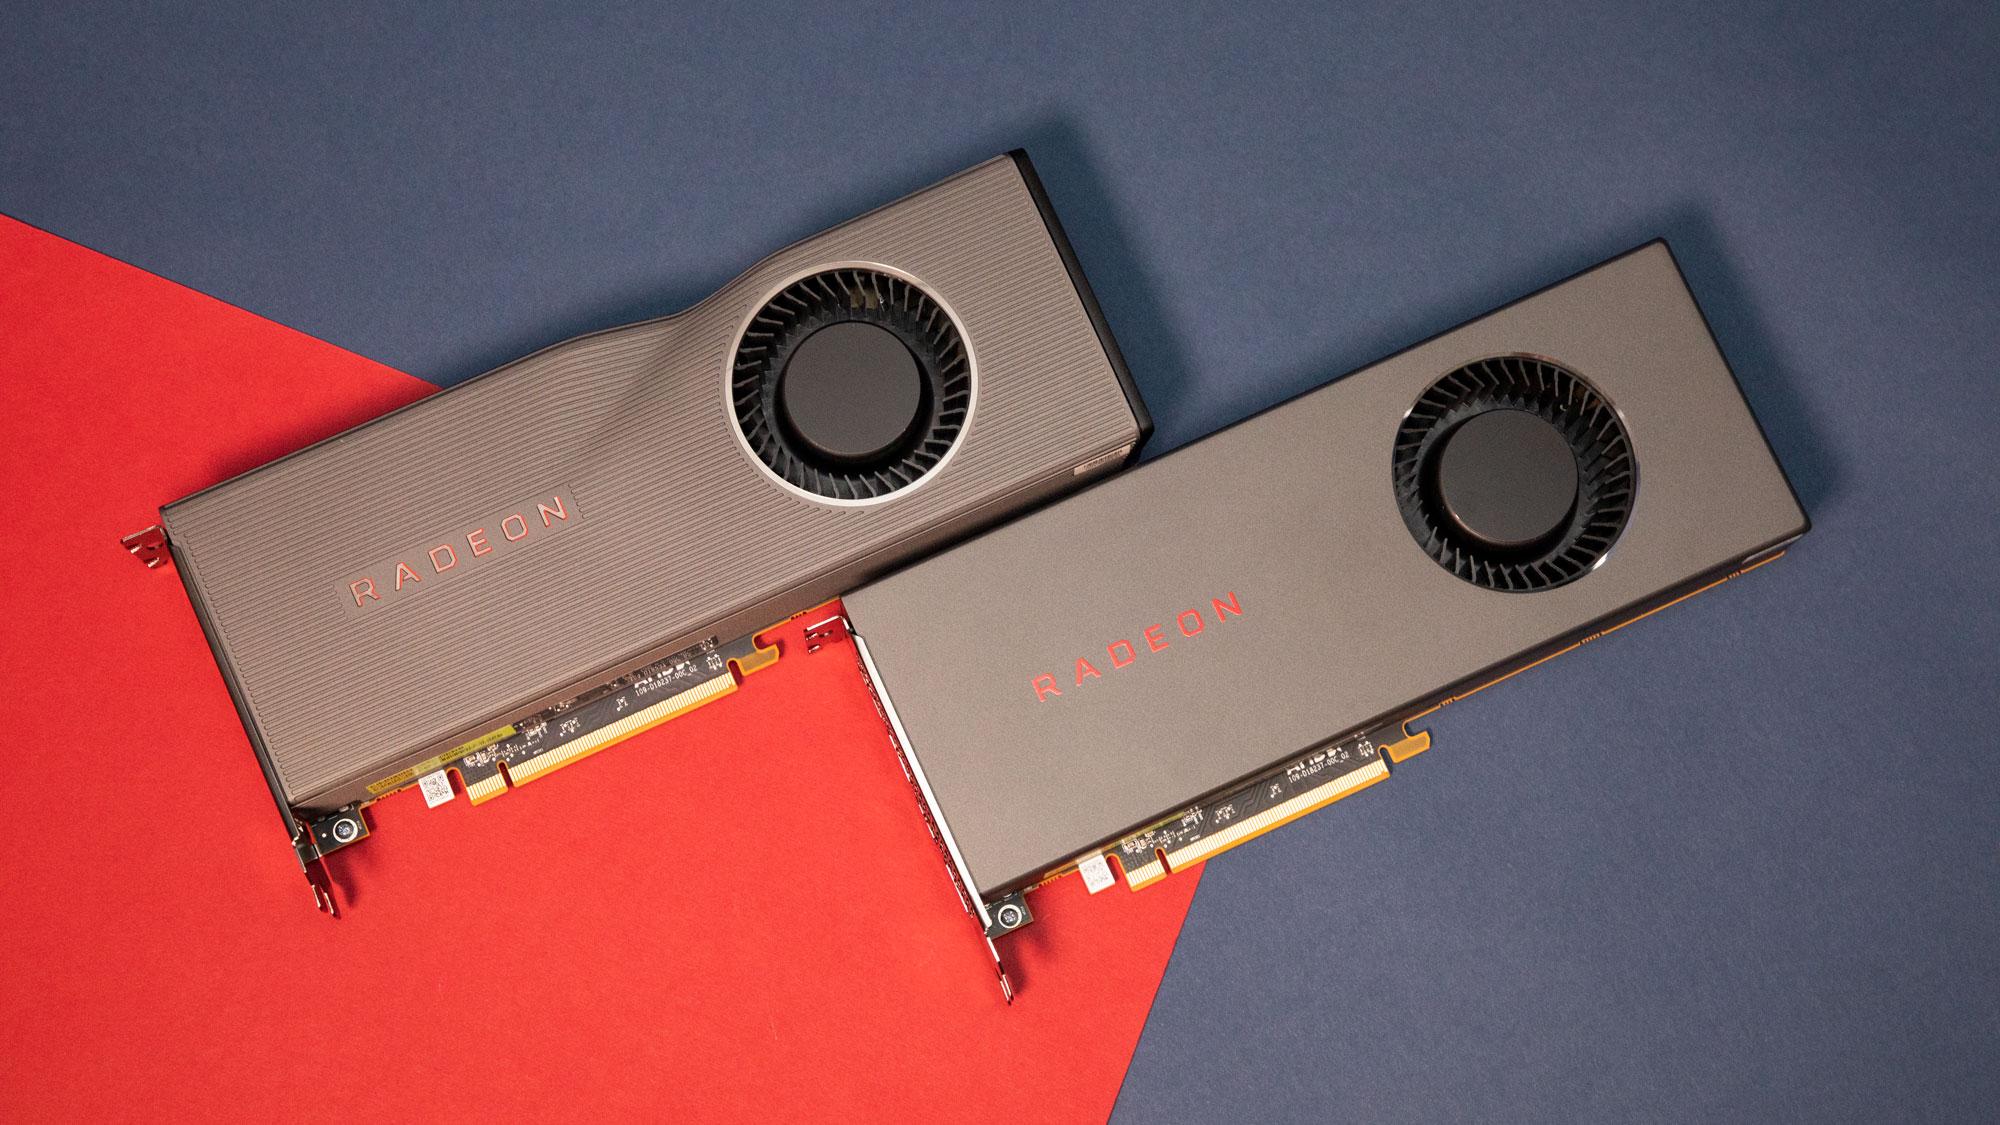 Amd Radeon Rx 5700 Vs Rx 5700 Xt What S The Best Amd Gpu For You Techradar